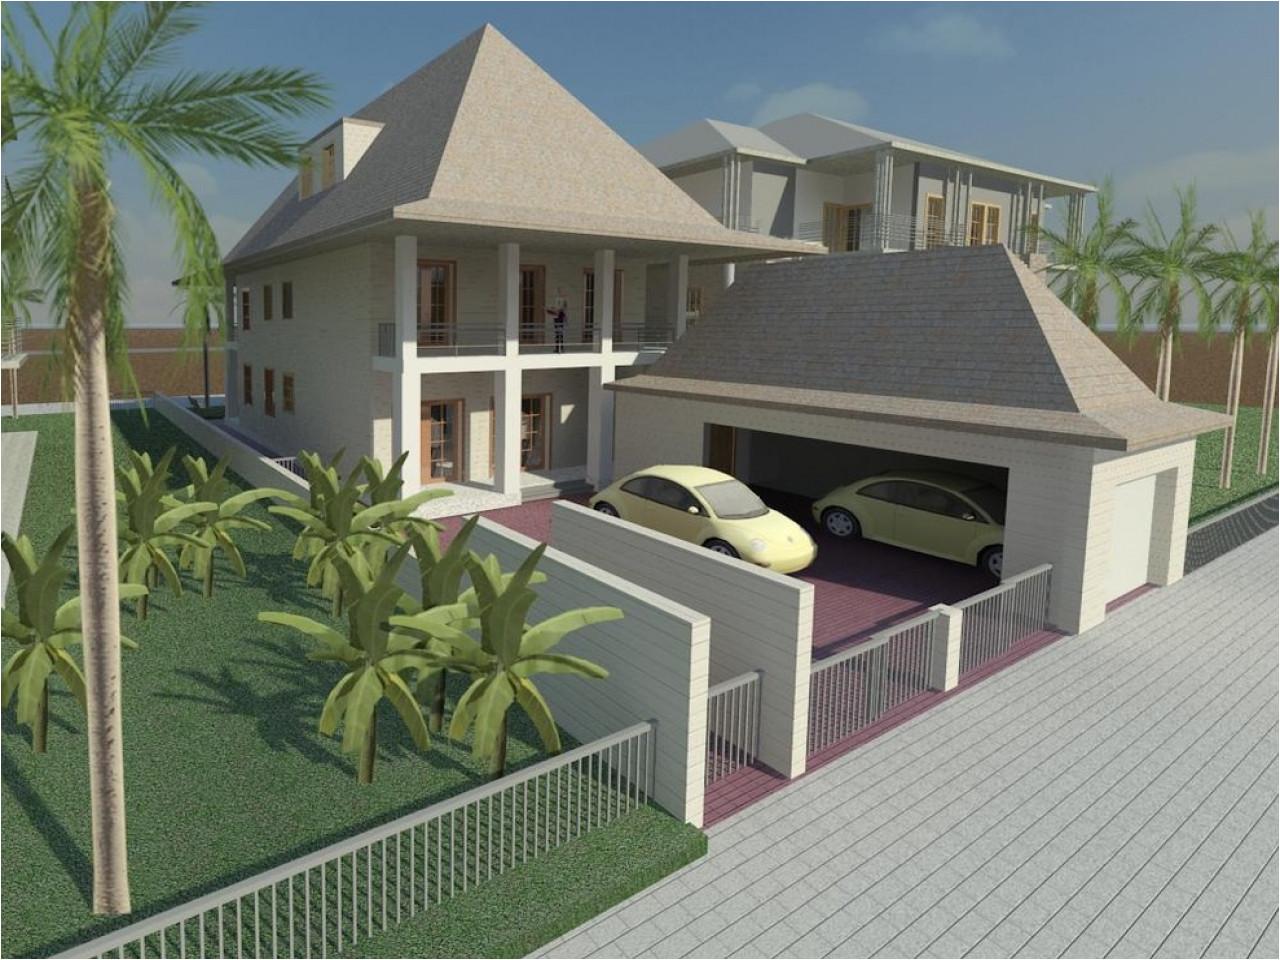 d6f6ed72e98c4b52 rosemary beach beachfront rentals rosemary beach florida house plans